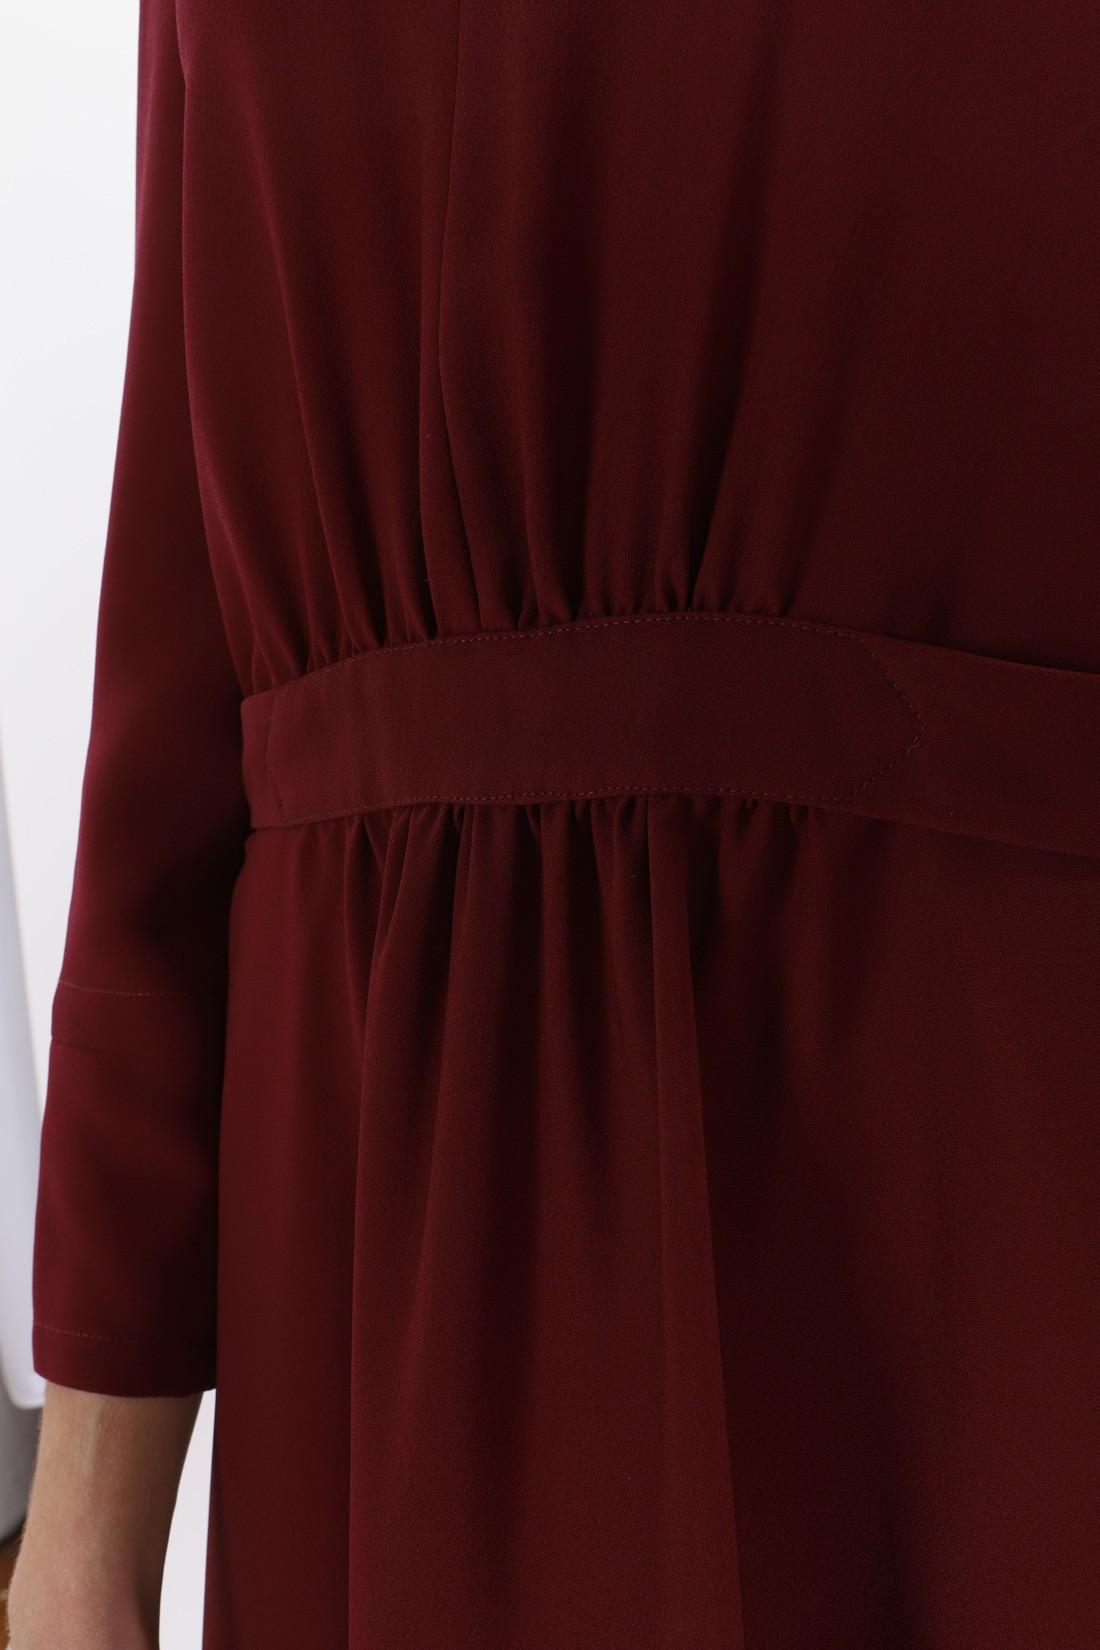 A.P.C. FOR WOMAN / Robe bing Bordeaux